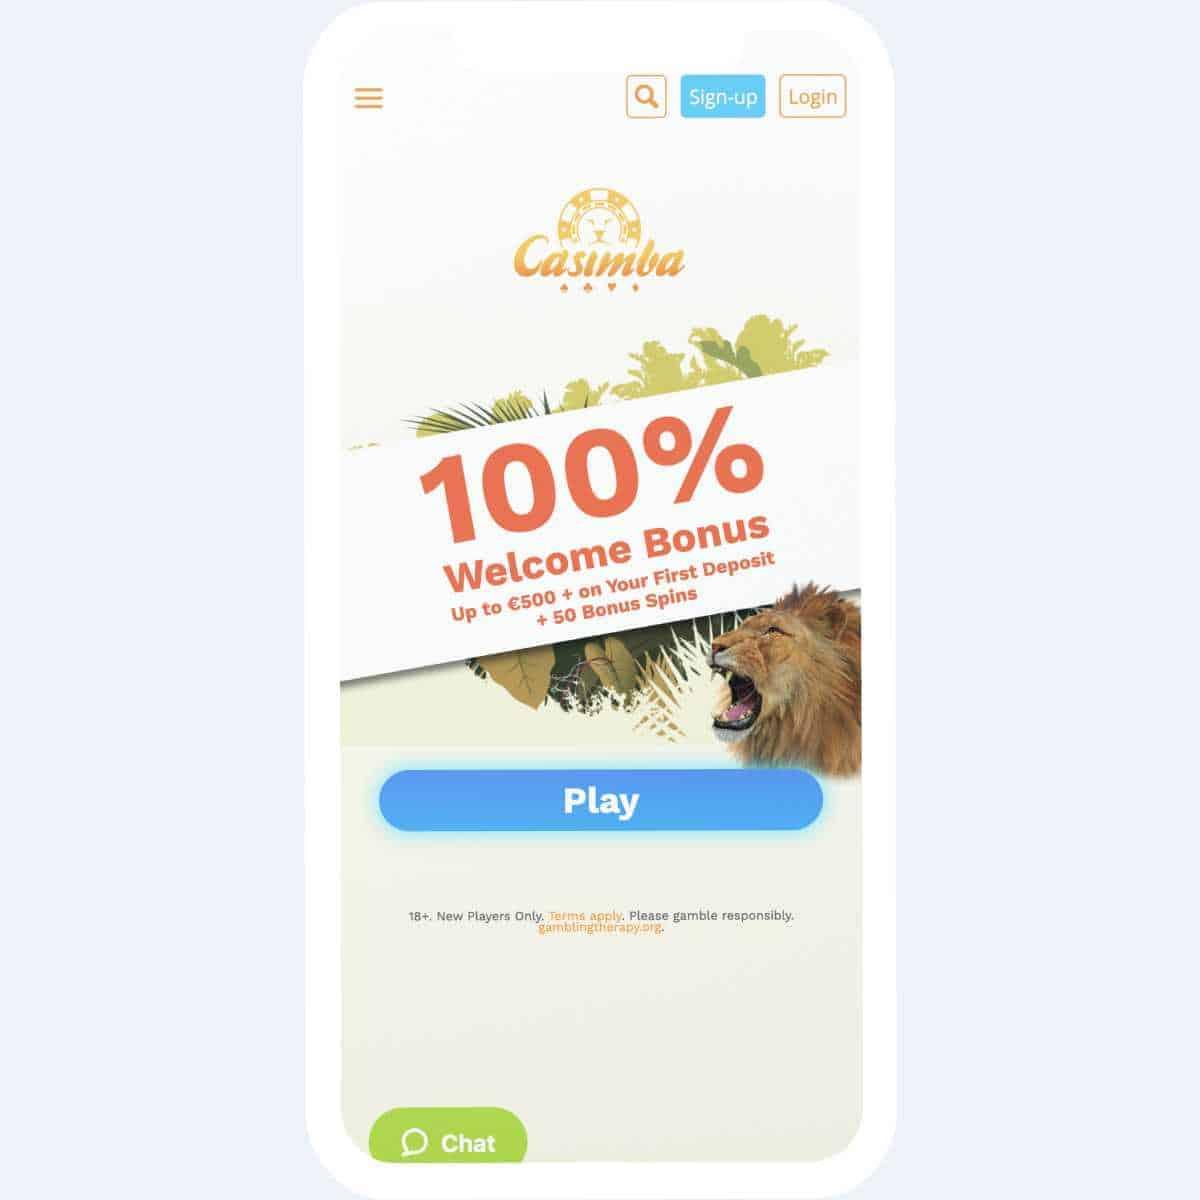 casimba welcome bonus mobile